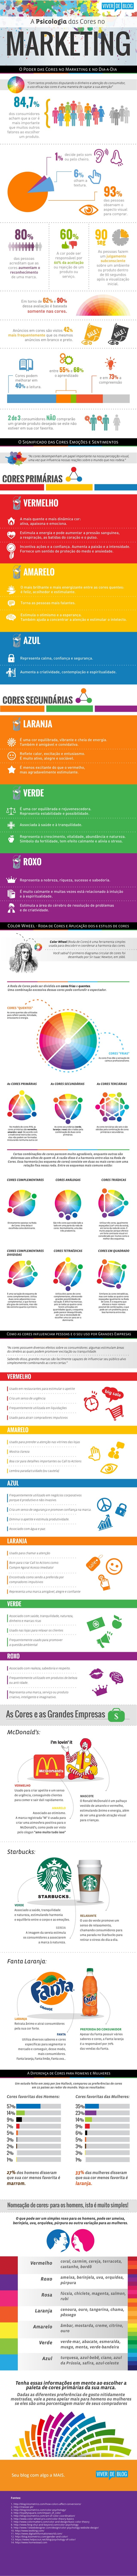 [Viver de blog] infográfico psicologia cores